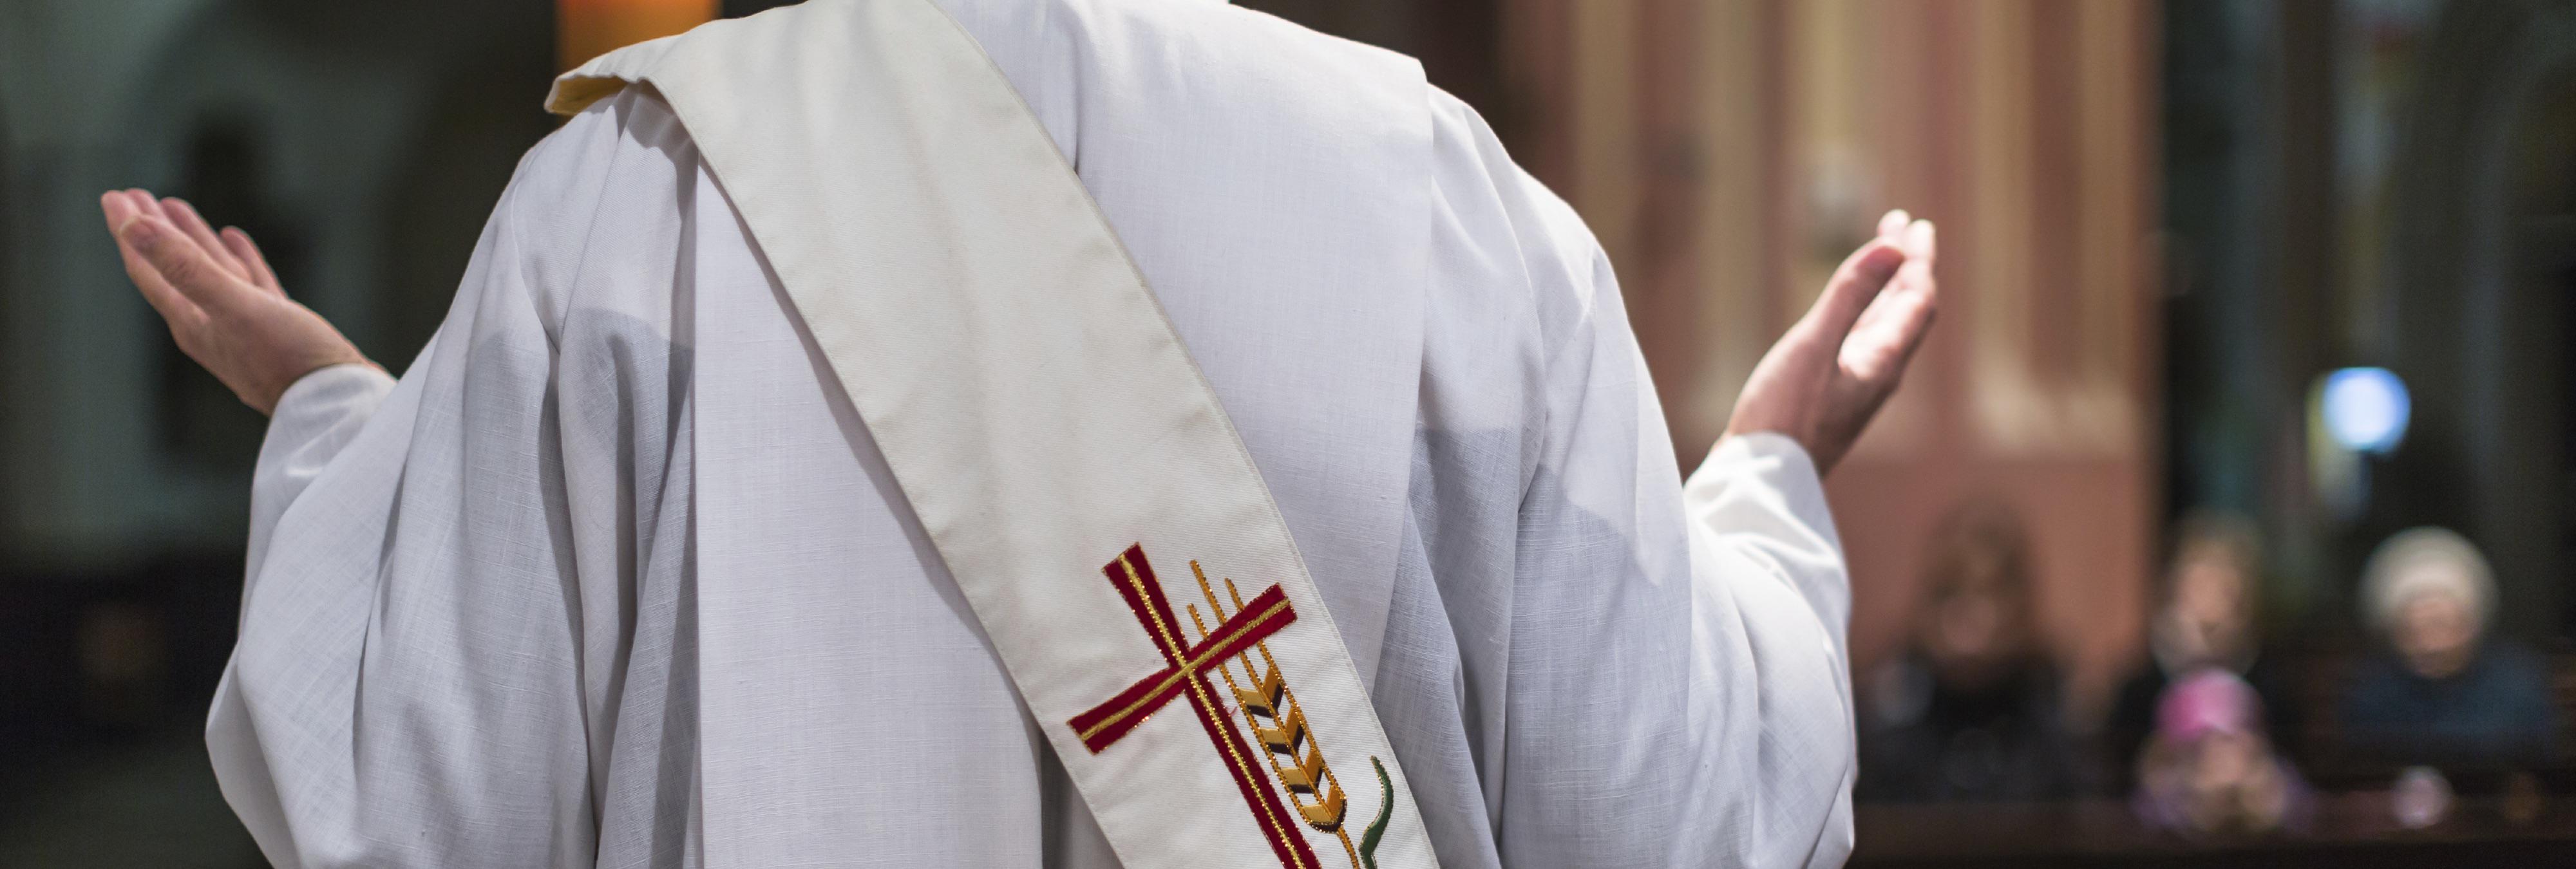 La Iglesia Católica lucha contra leyes anti pederastia